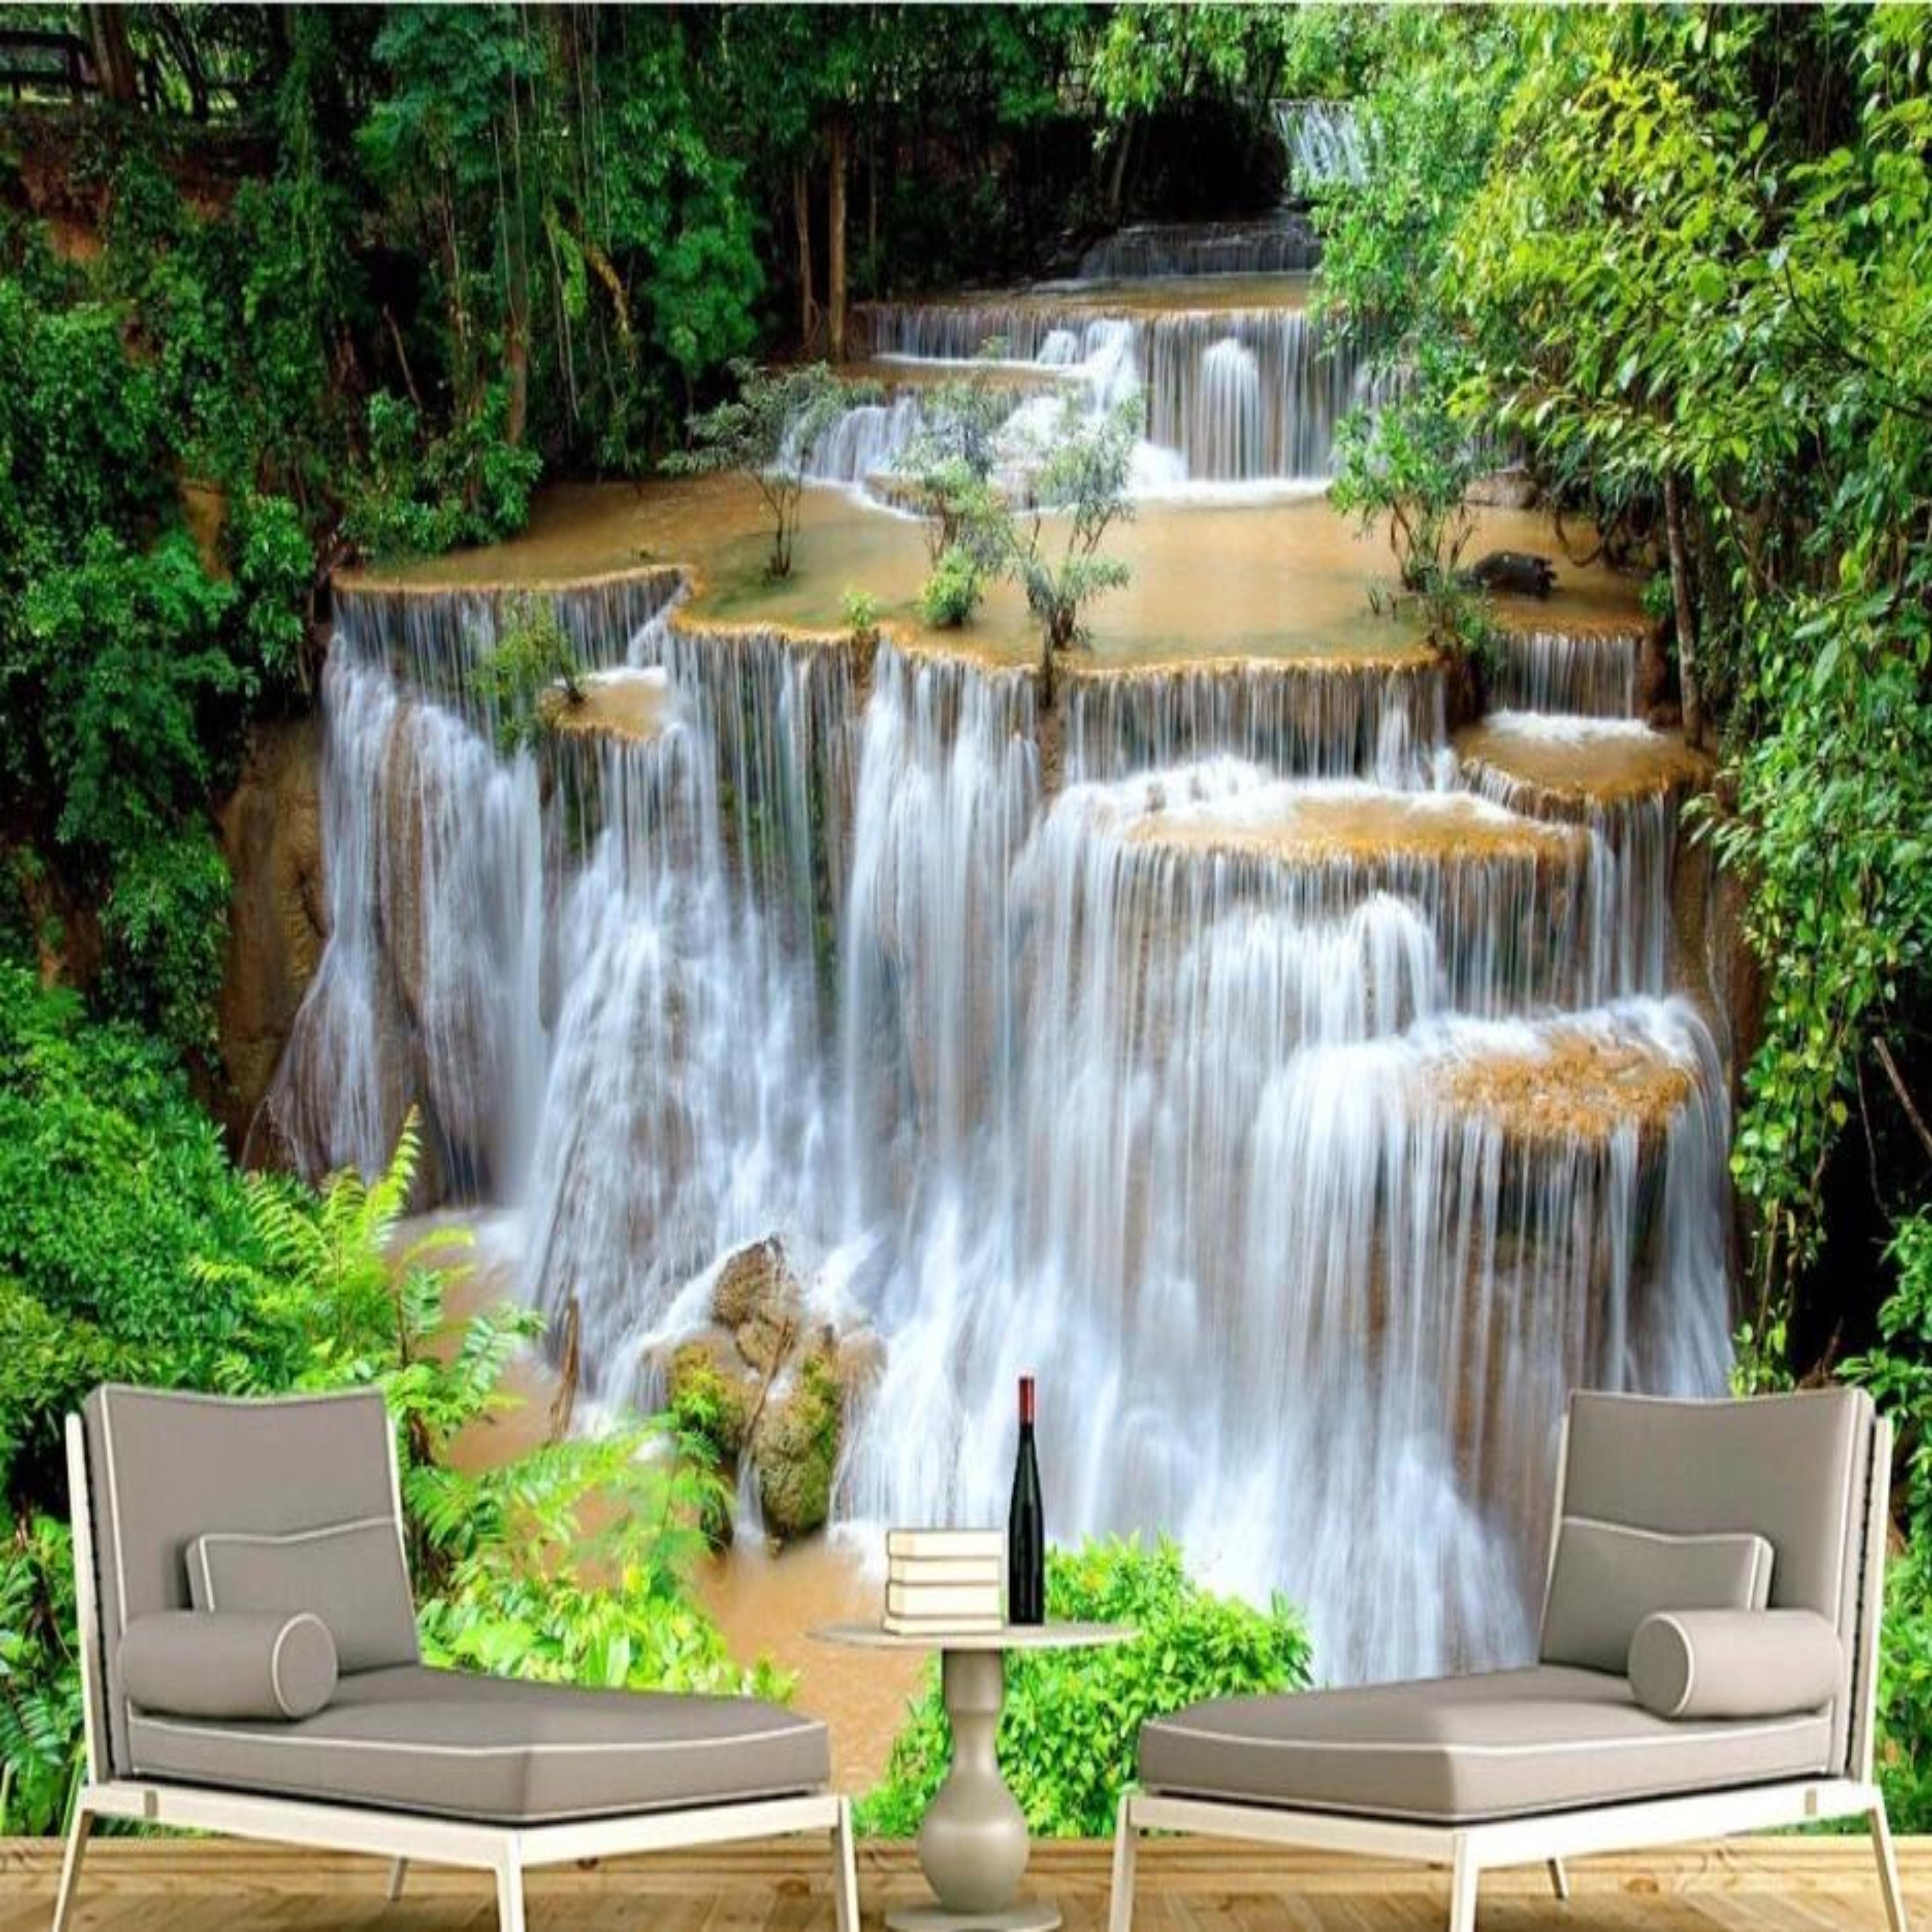 Custom 3D Photo Wallpaper HD Green Landscape Waterfall Beautiful TV Background Mural Bedroom Living Room Canvas